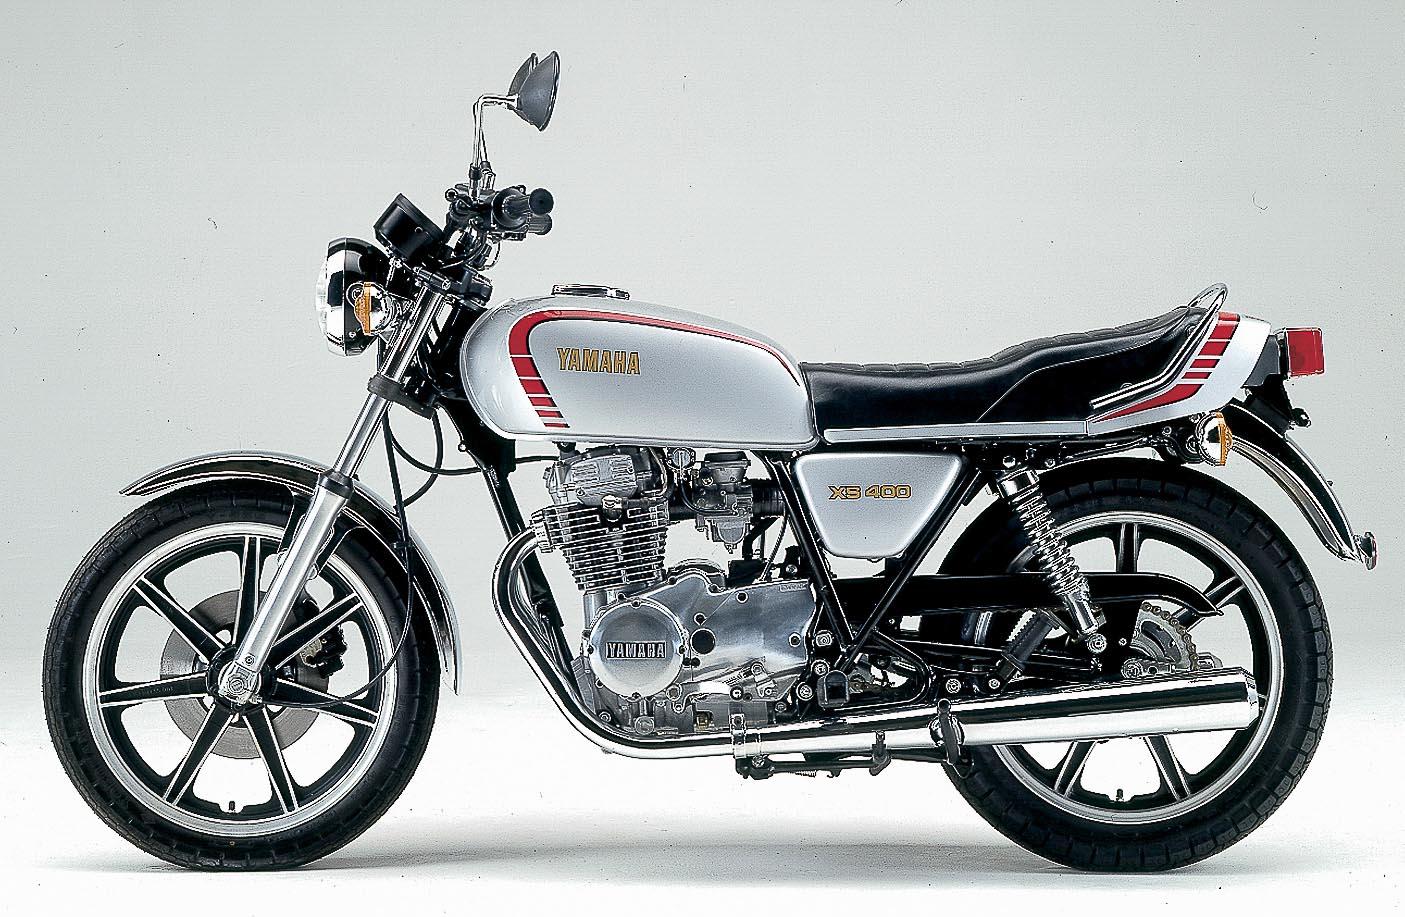 YAMAHA XS 400 (1978 - 1990)